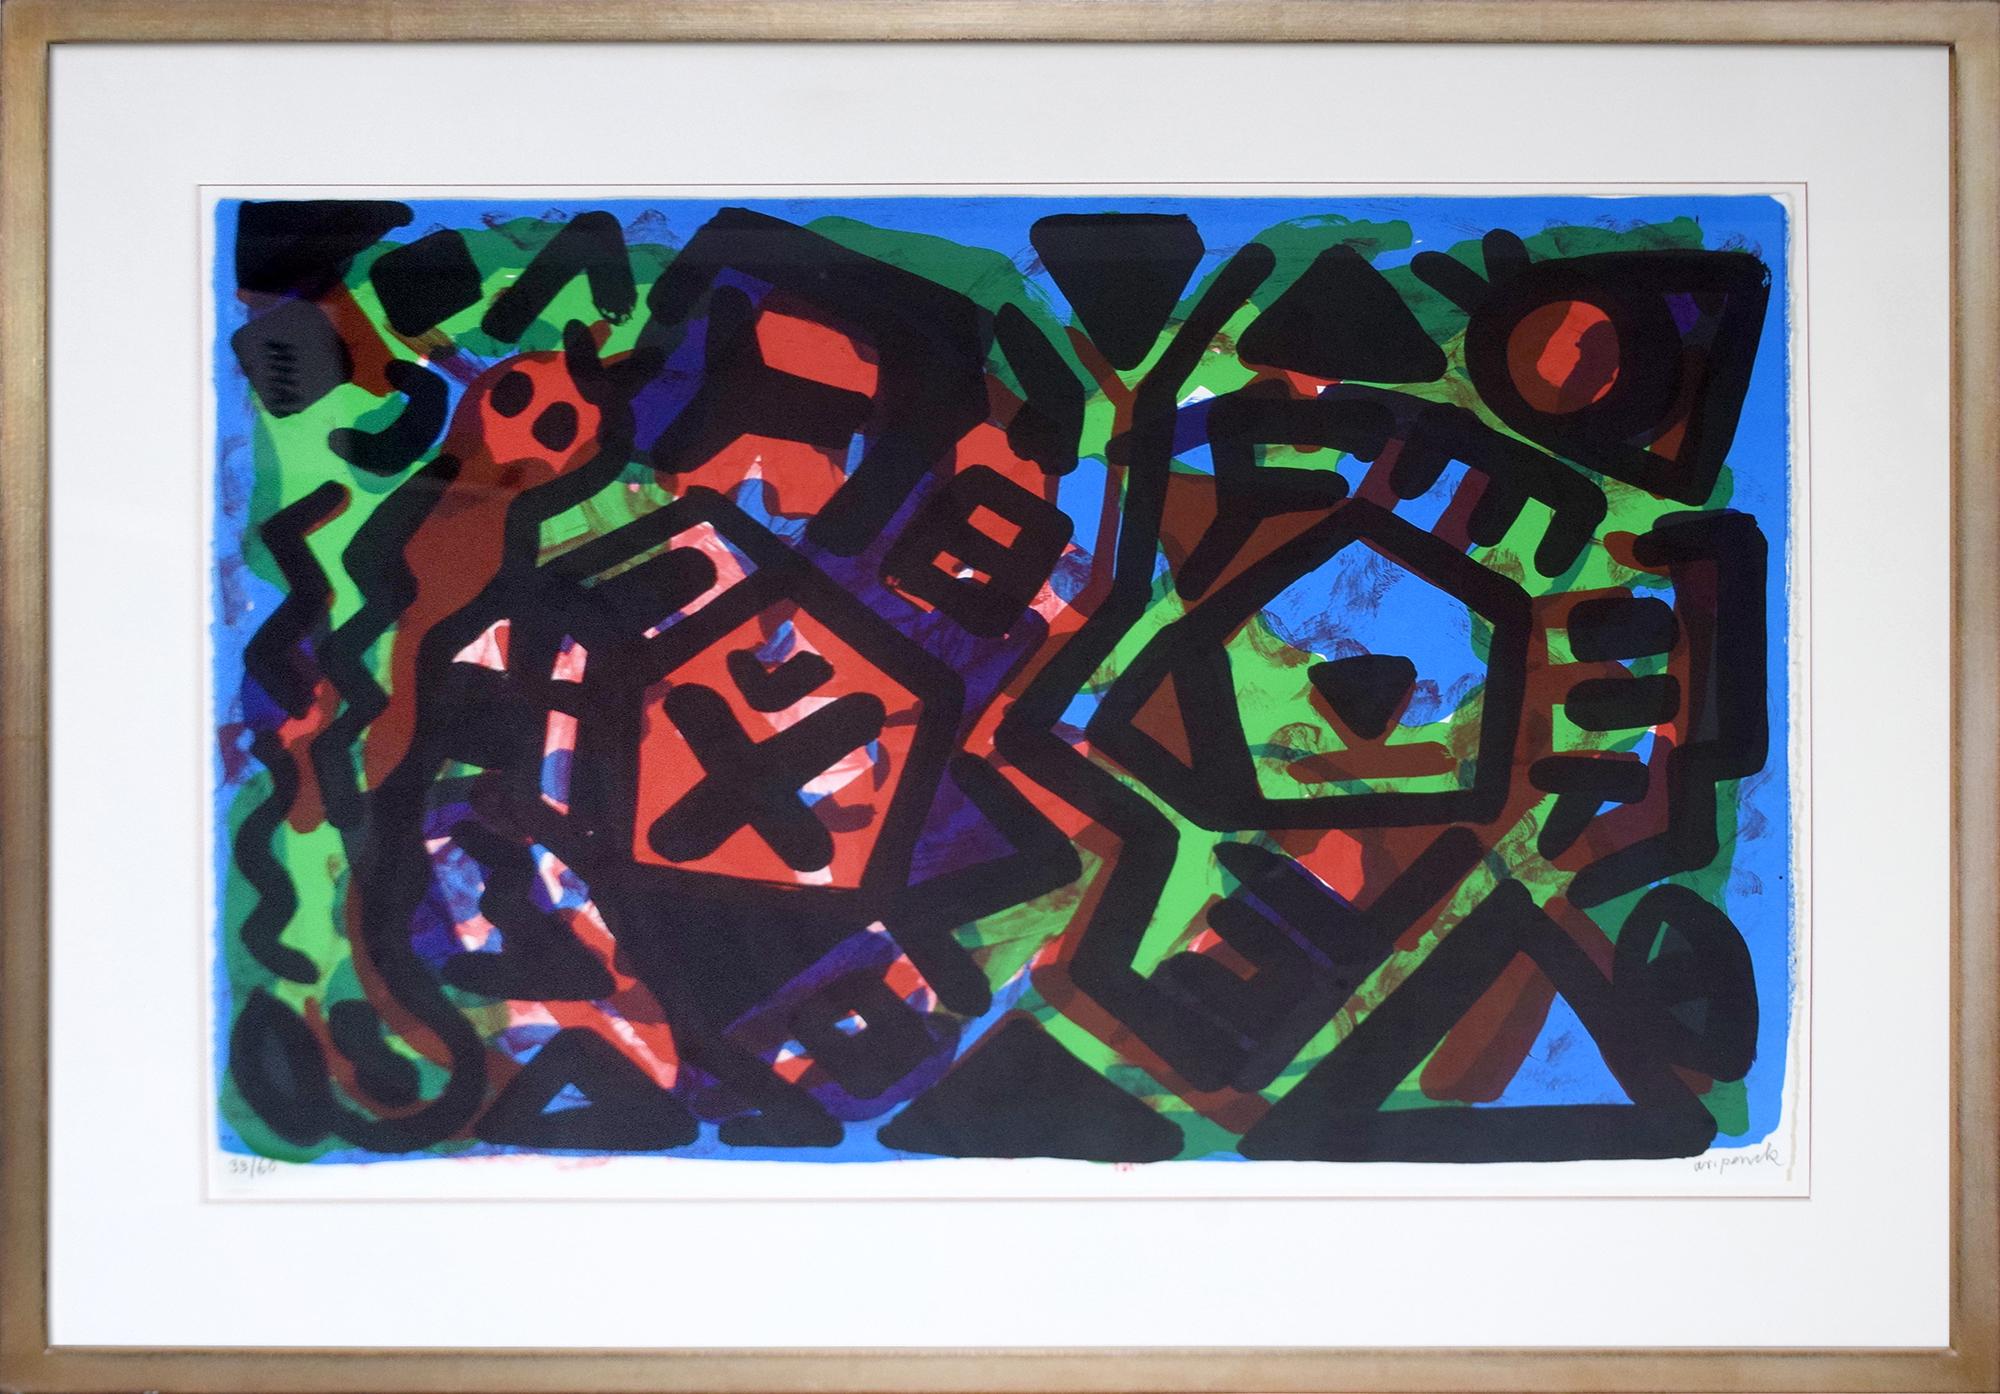 A. R. Penck - 2 Wege - 2 Probleme , 0592-008-015